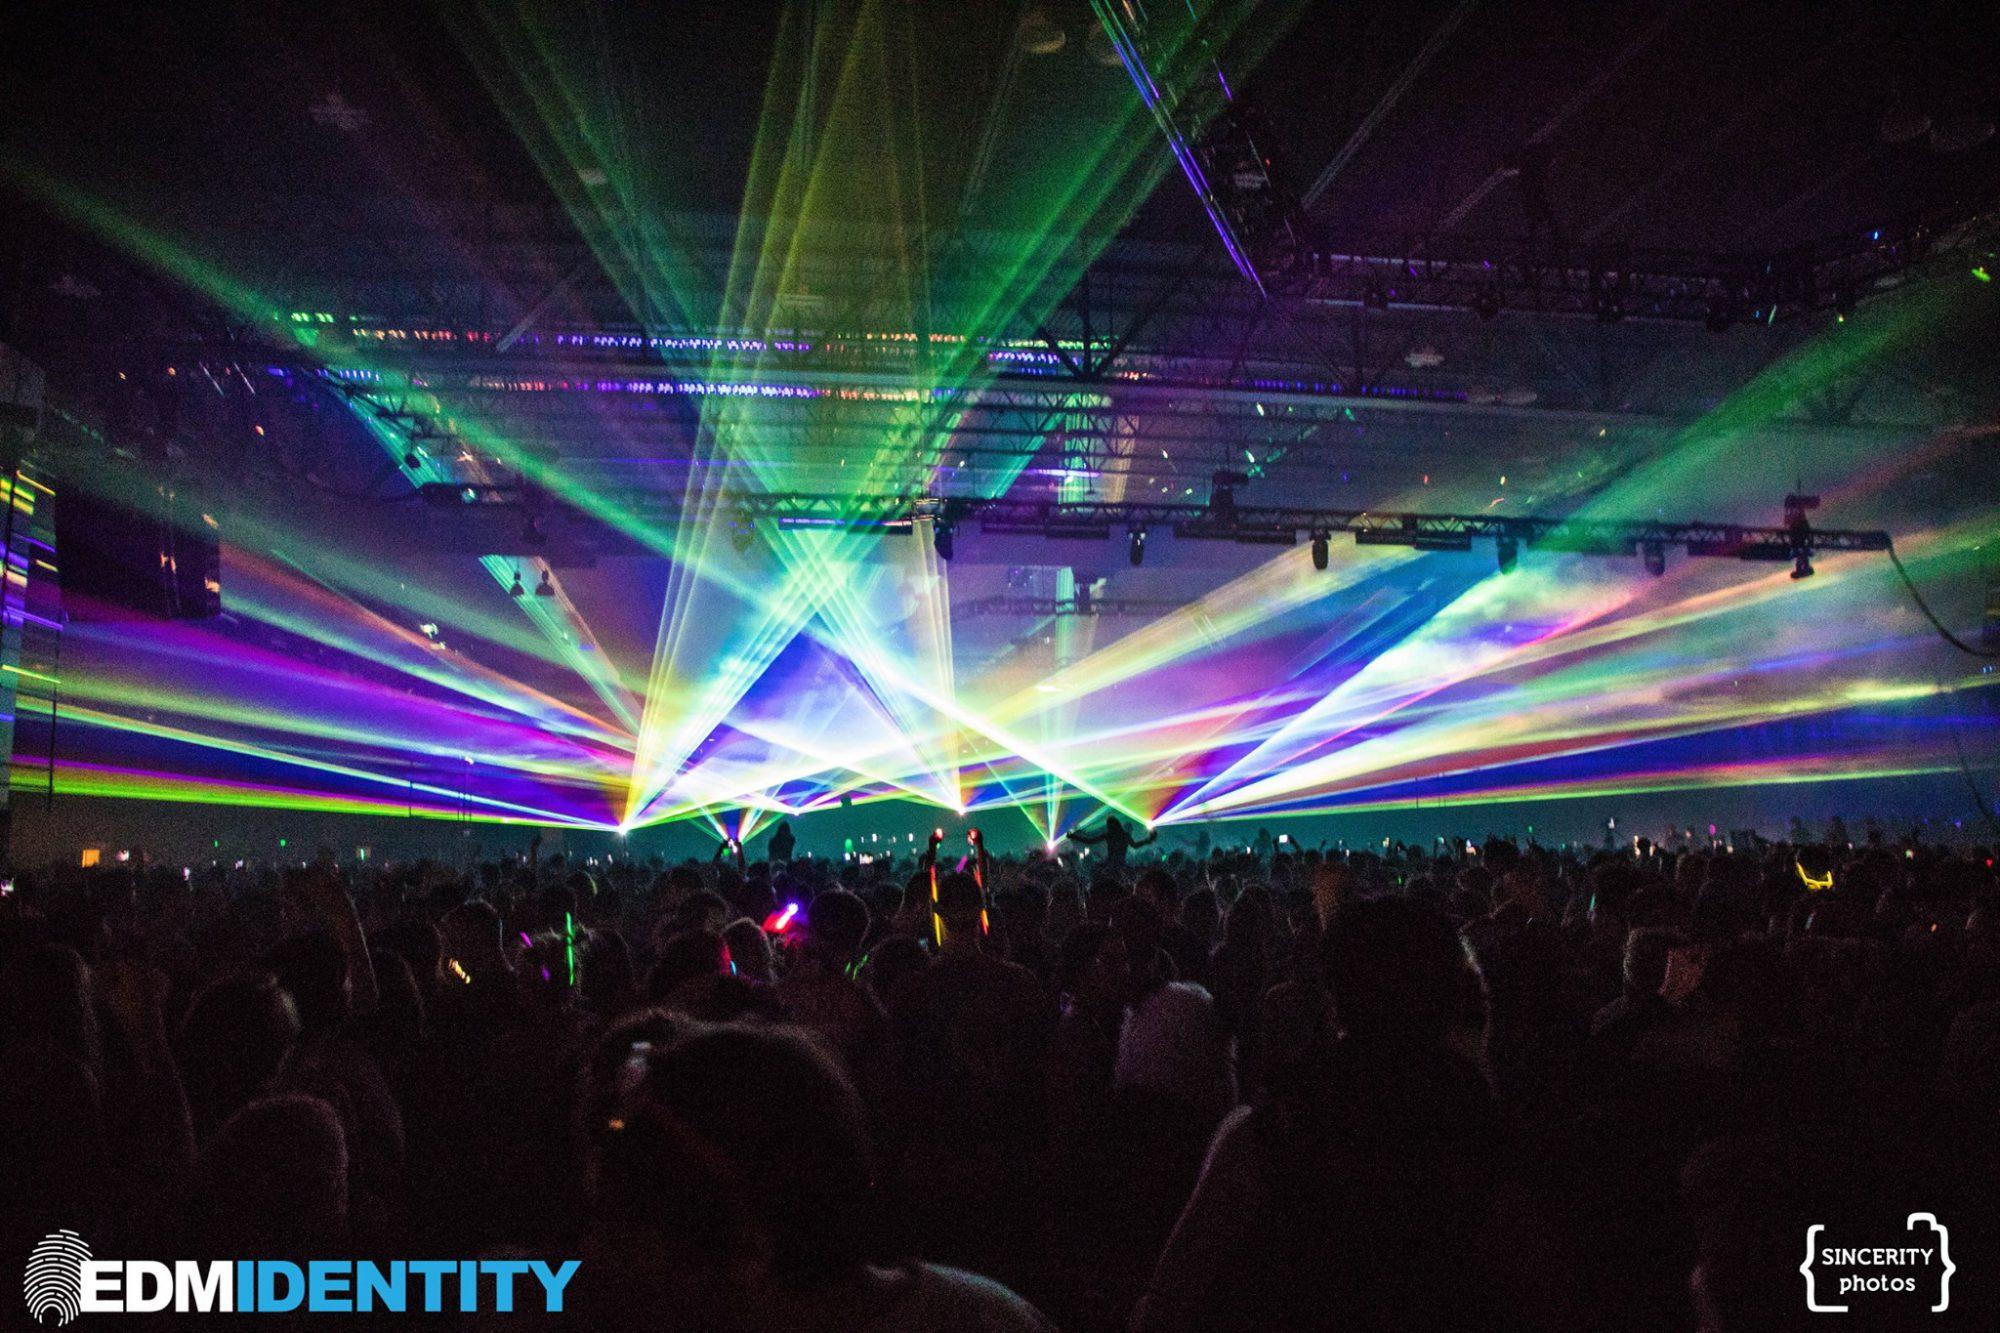 Decadence Colorado Bassnectar Lasers